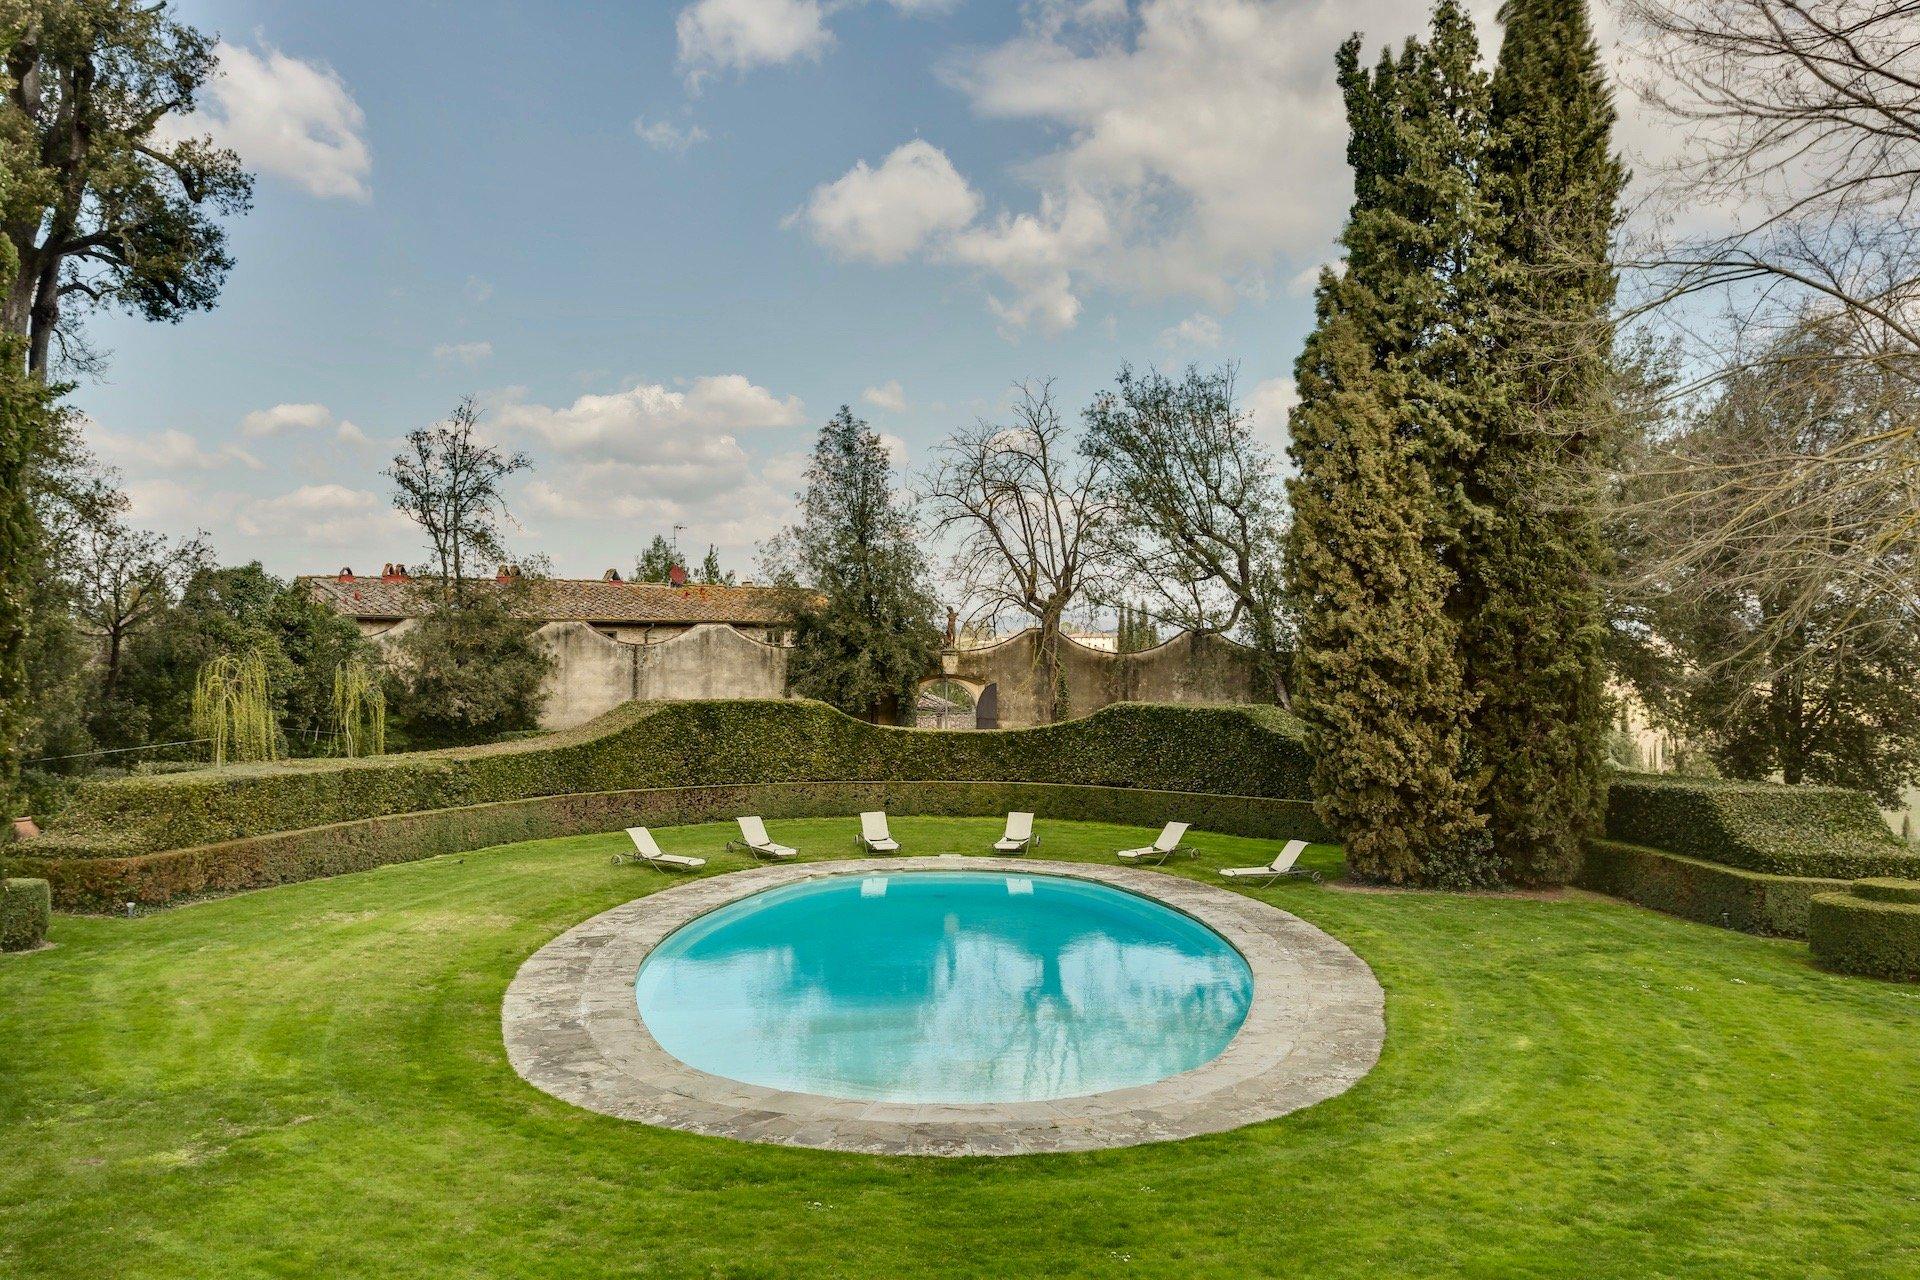 48.The Swimming Pool